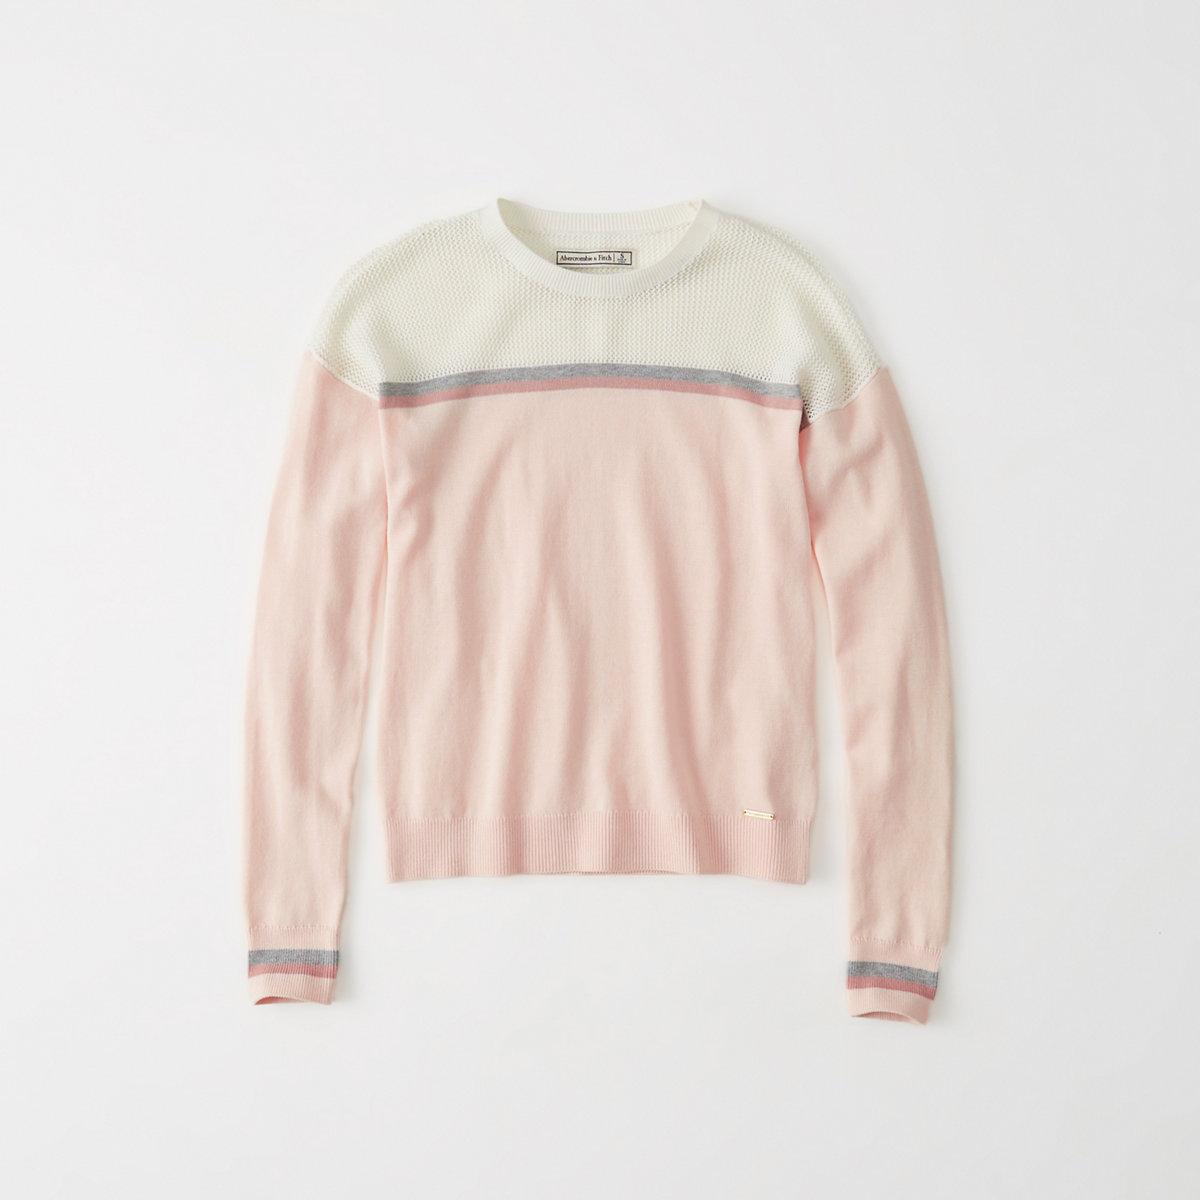 Mixed Stitch Crew Sweater